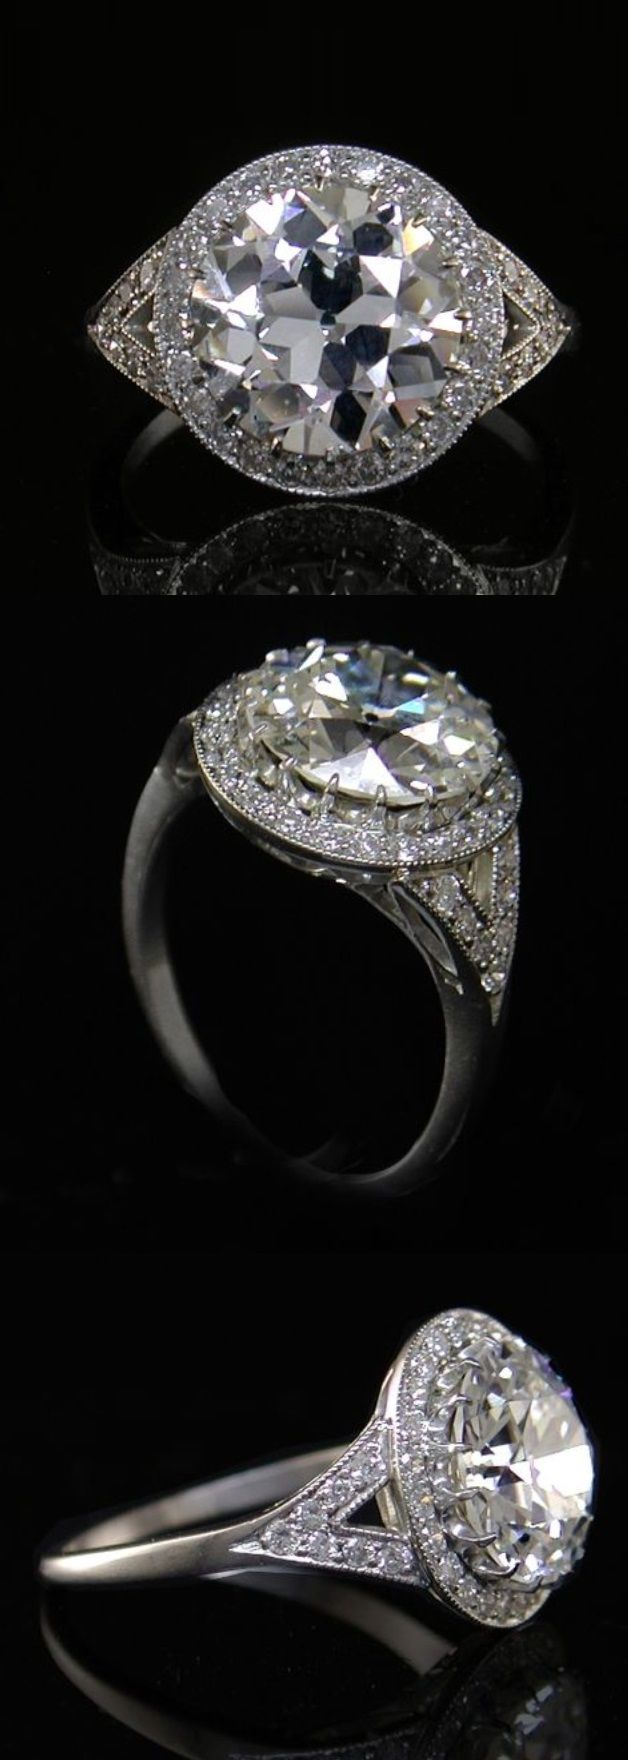 Bridal classics necklace sets mj 259 - An Art Deco Platinum And Diamond Ring 1930s Centring An Old European Cut Diamond